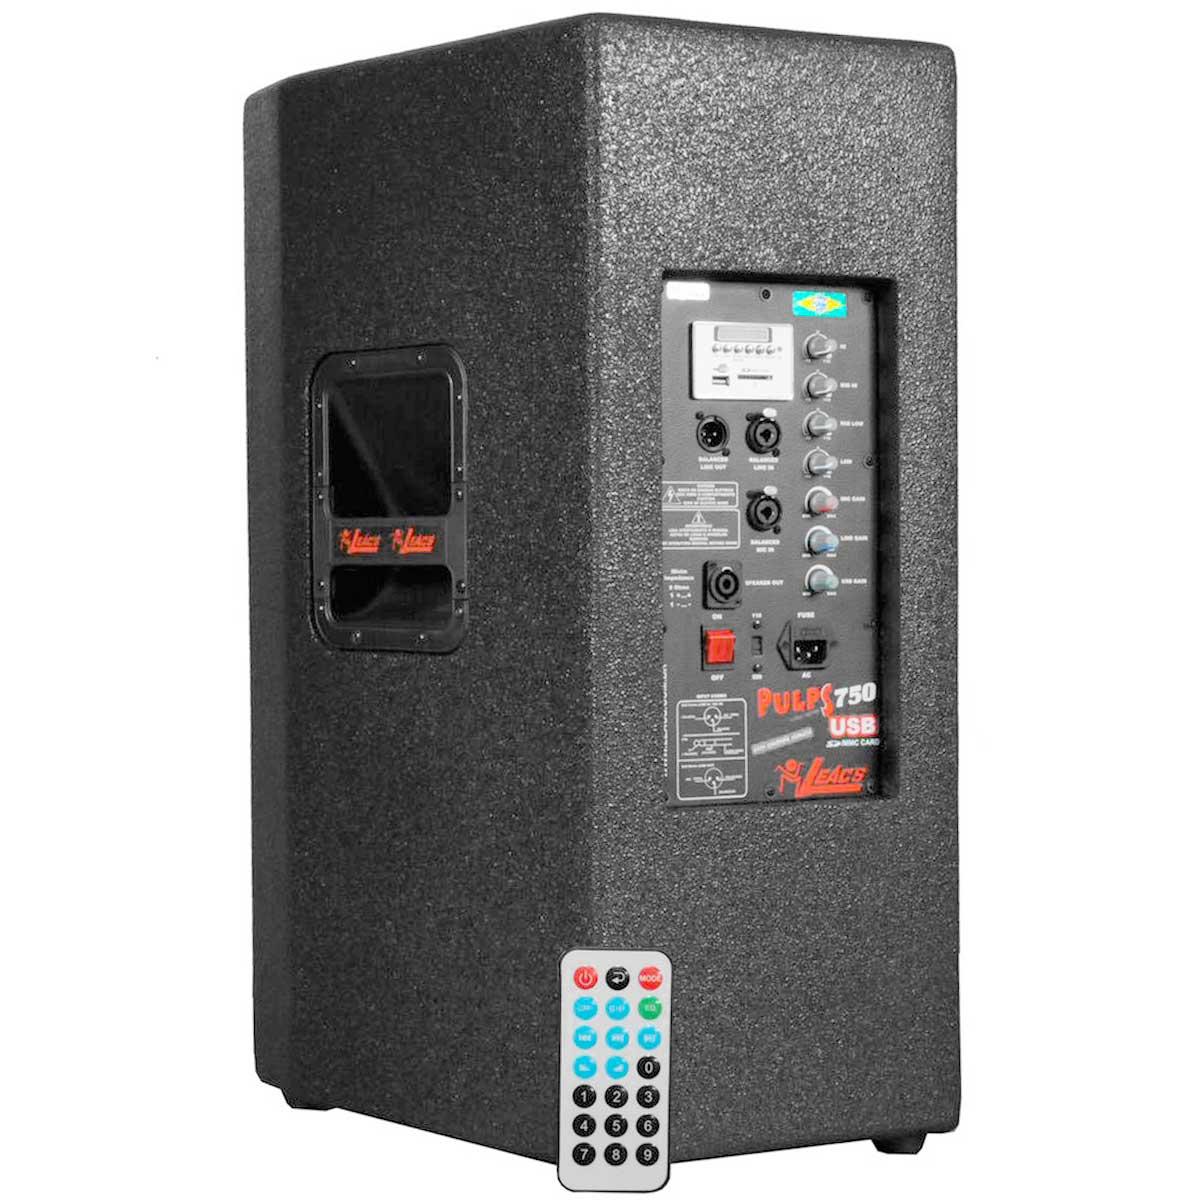 750A - Caixa Ativa 300W c/ Player USB Pulps 750 A - Leacs